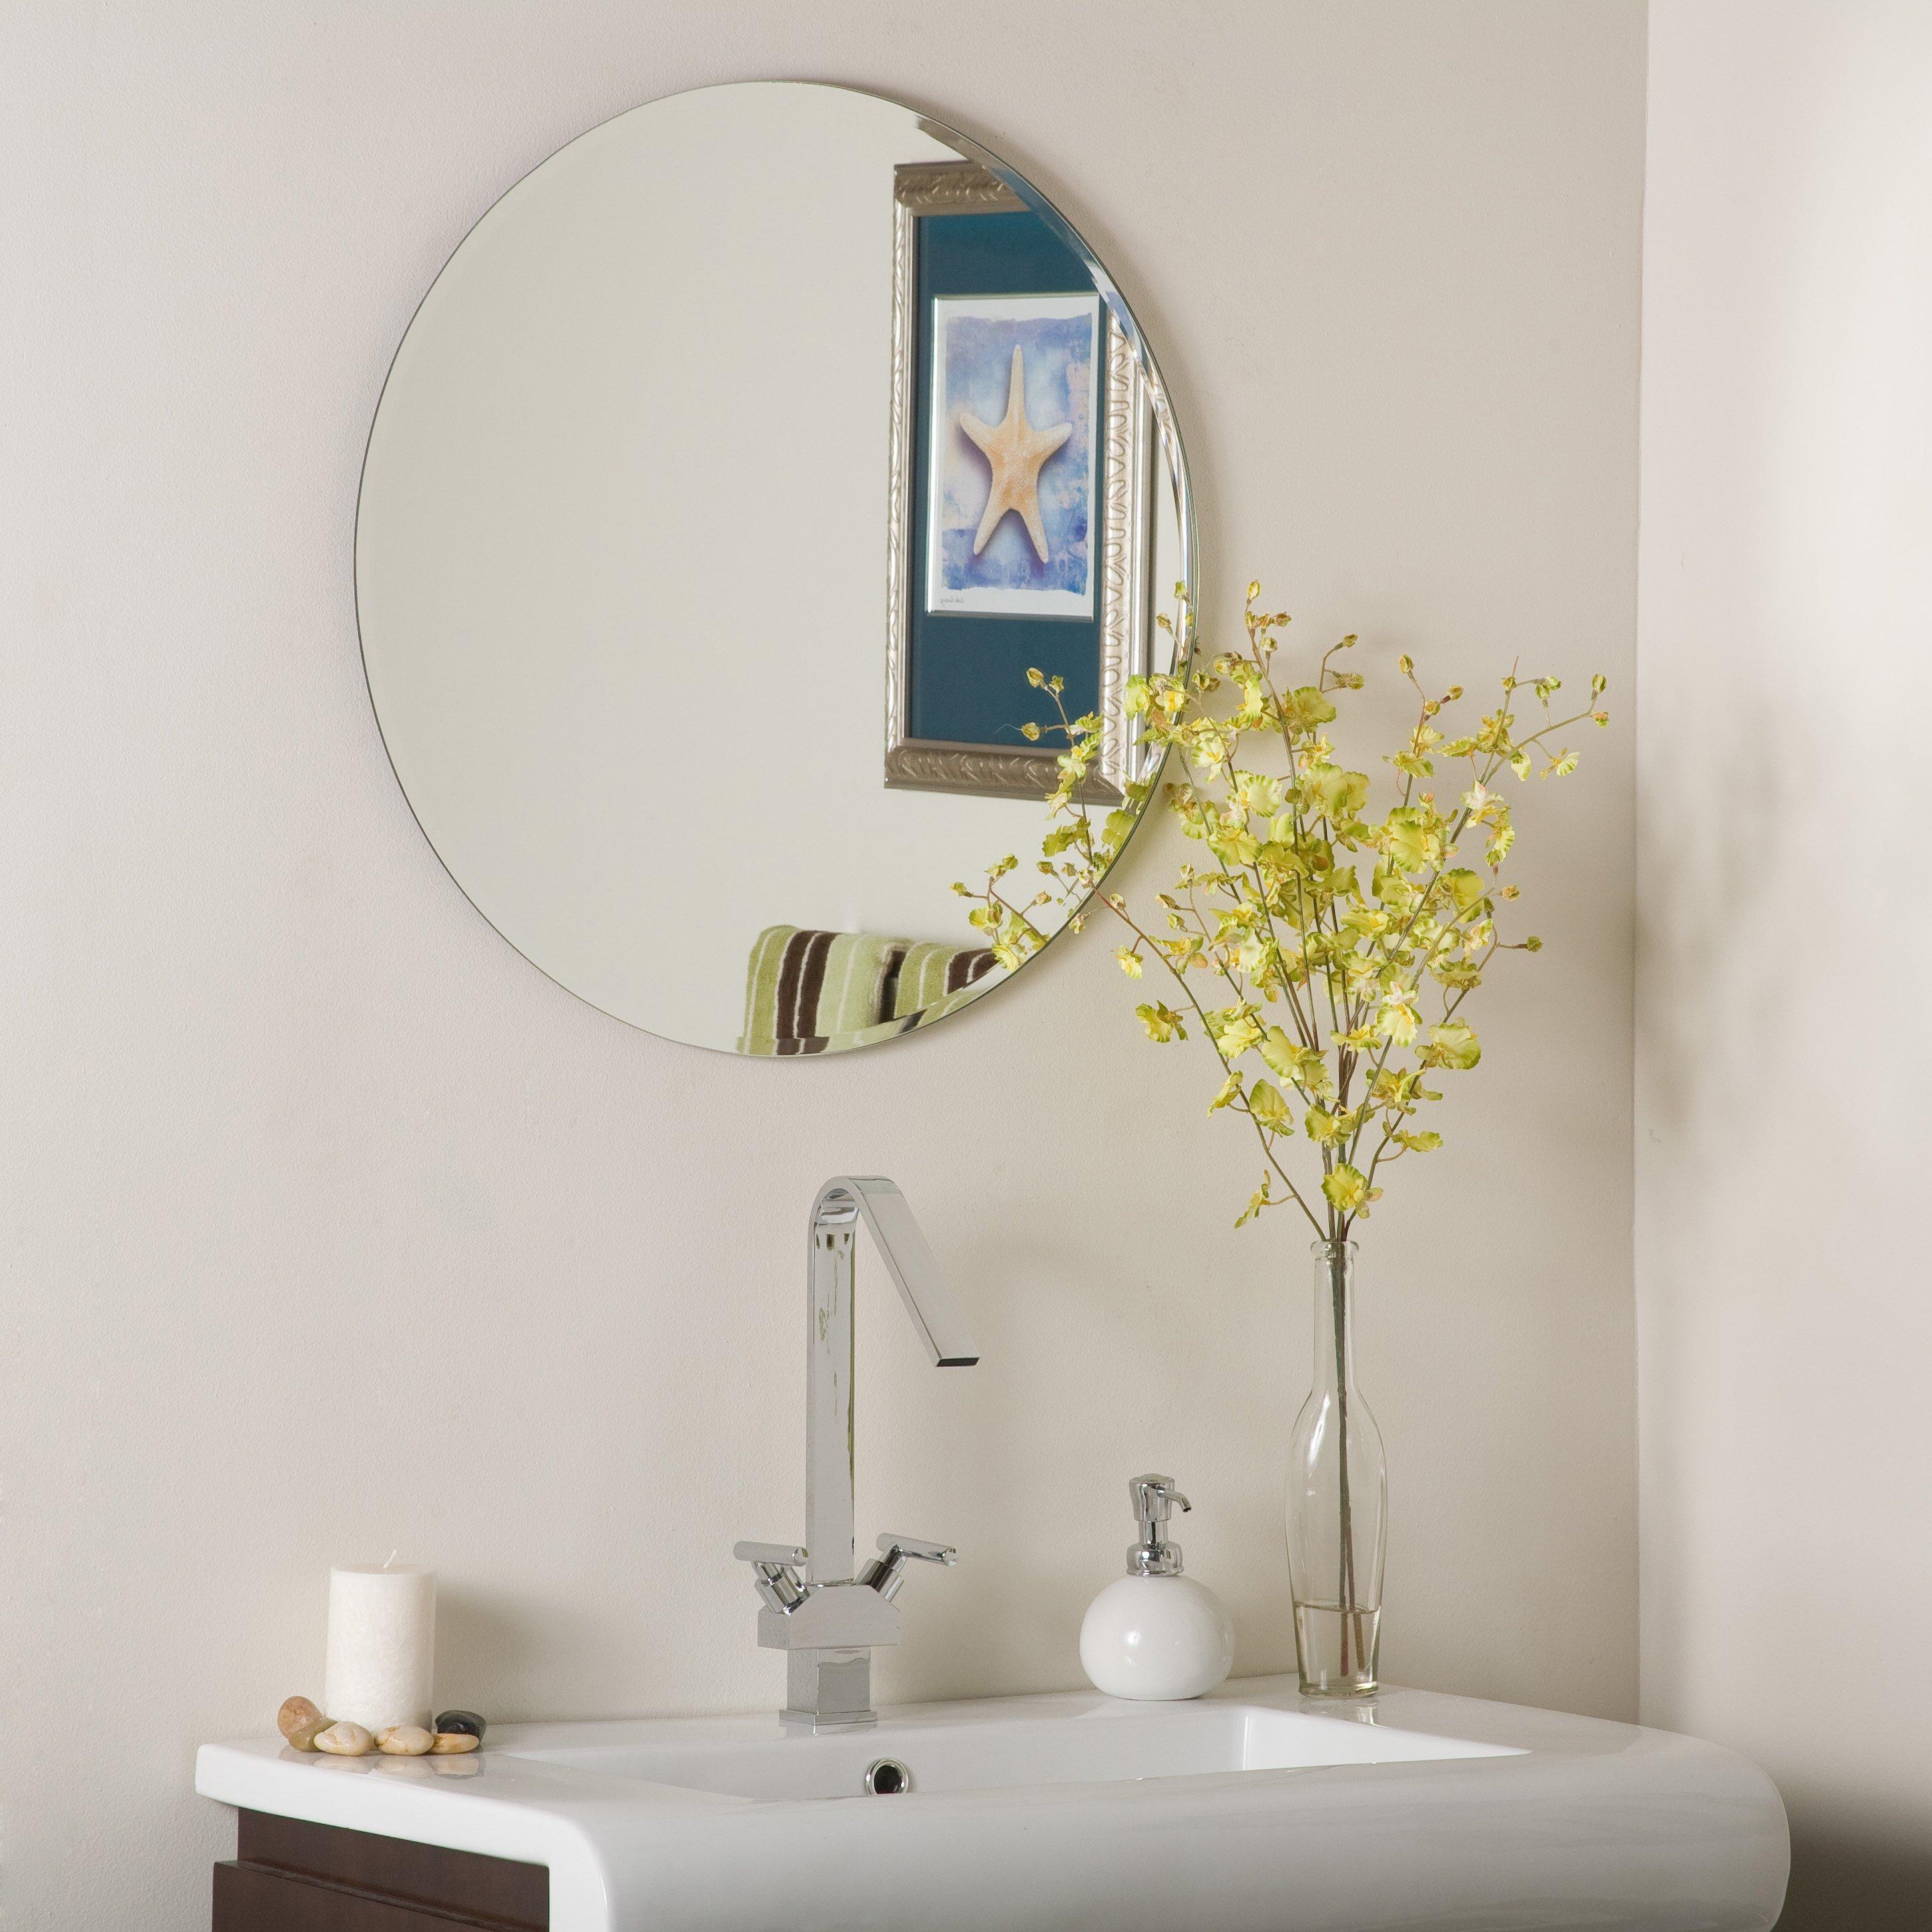 Amusing Frameless Wall Mirror Home Depot Argos Gym Pivoting Regarding Wallingford Large Frameless Wall Mirrors (Image 3 of 20)